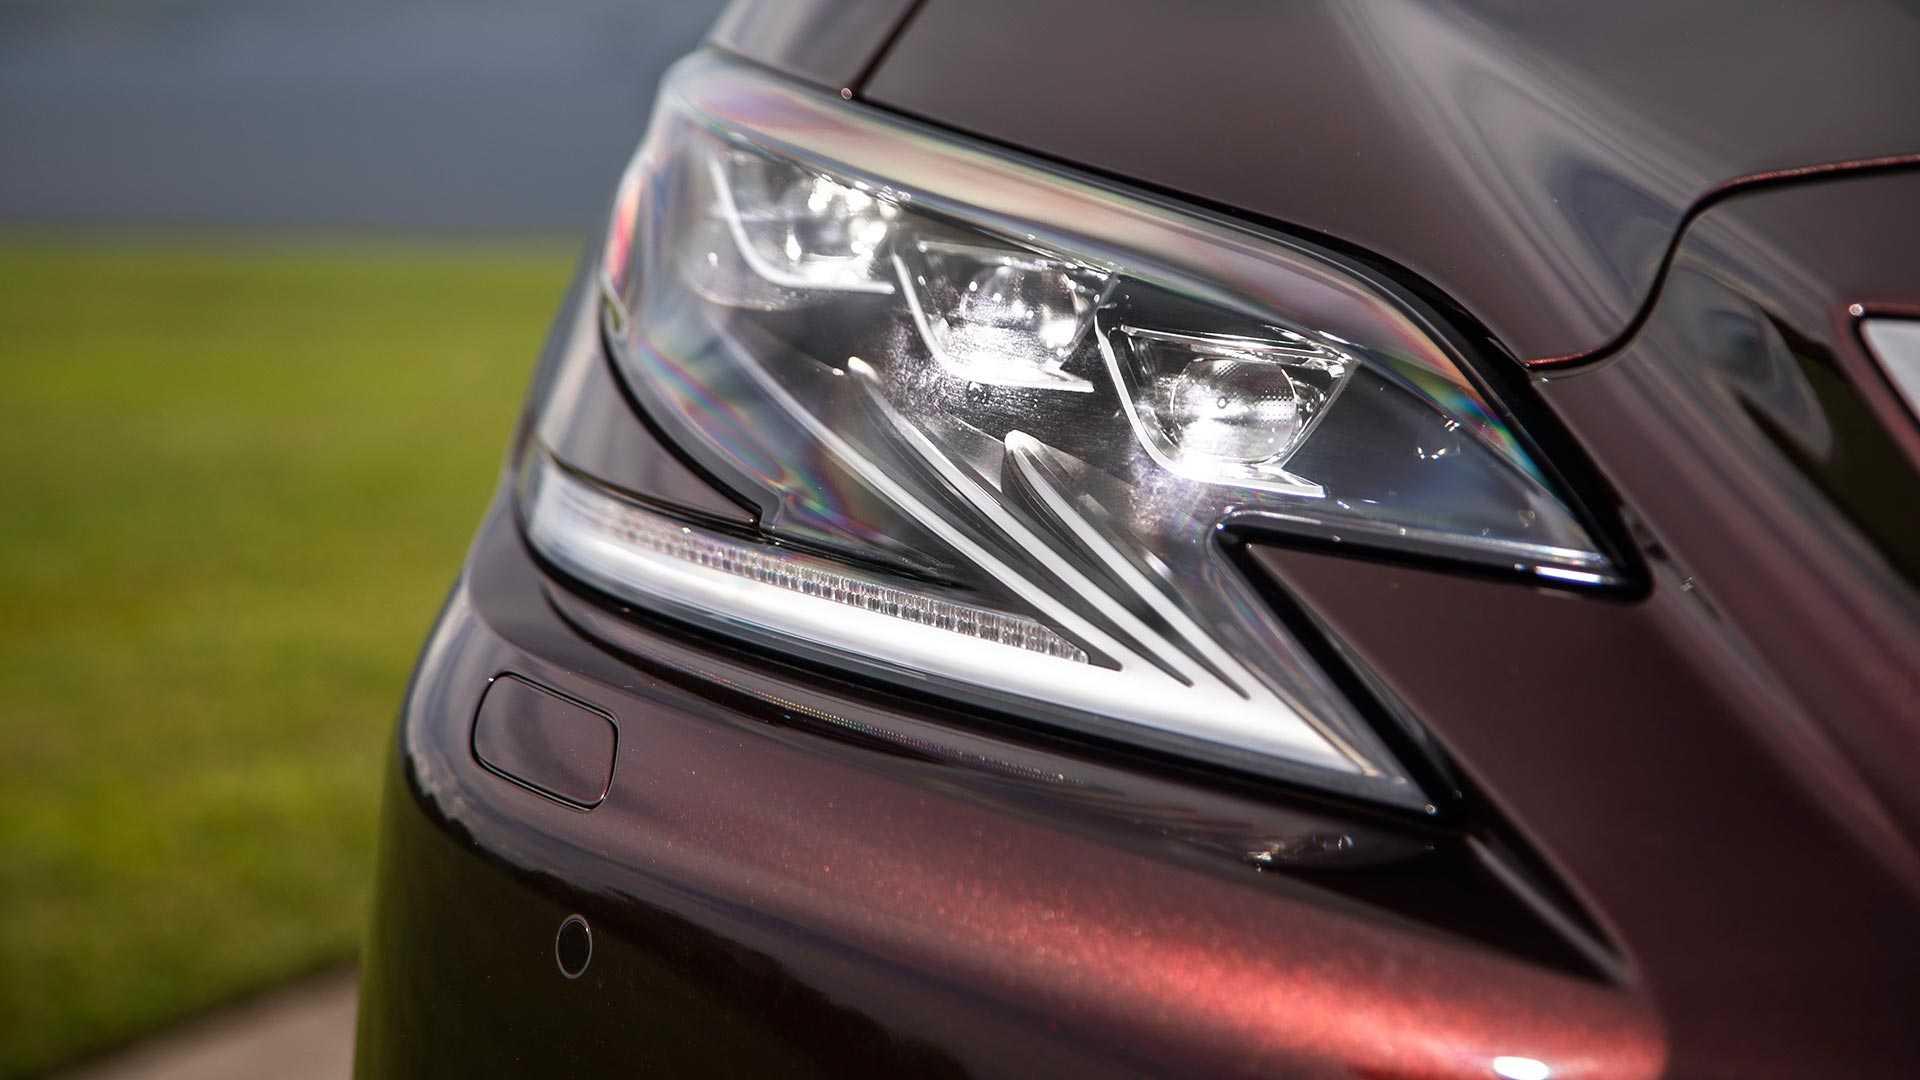 2020 Lexus LS 500 Inspiration Series Headlight Wallpapers (8)